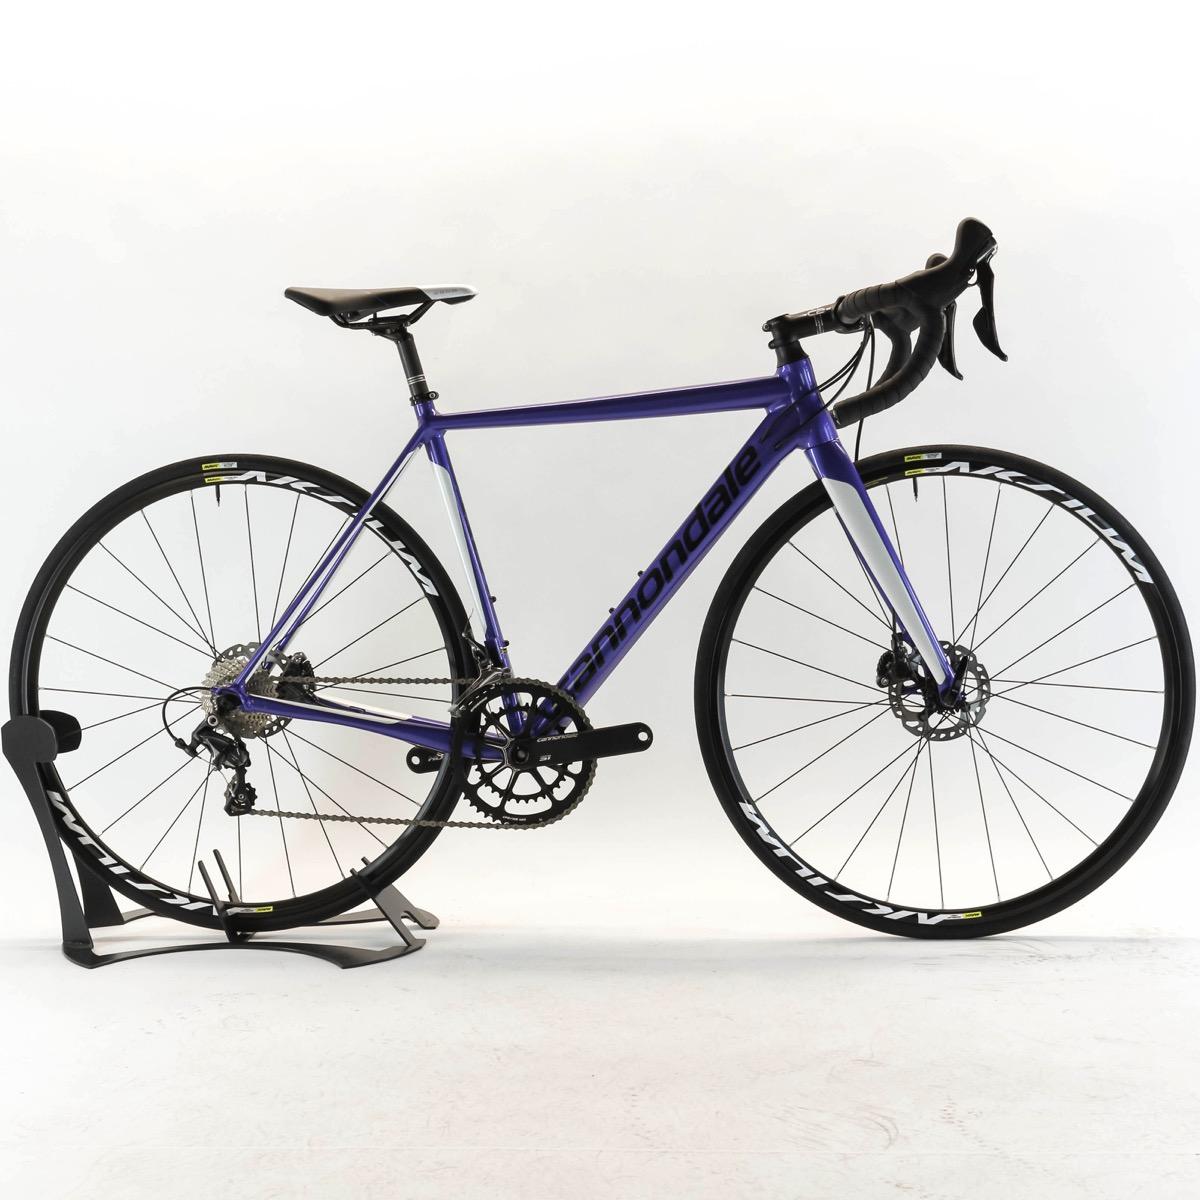 Ebay Cannondale Bike | www.topsimages.com